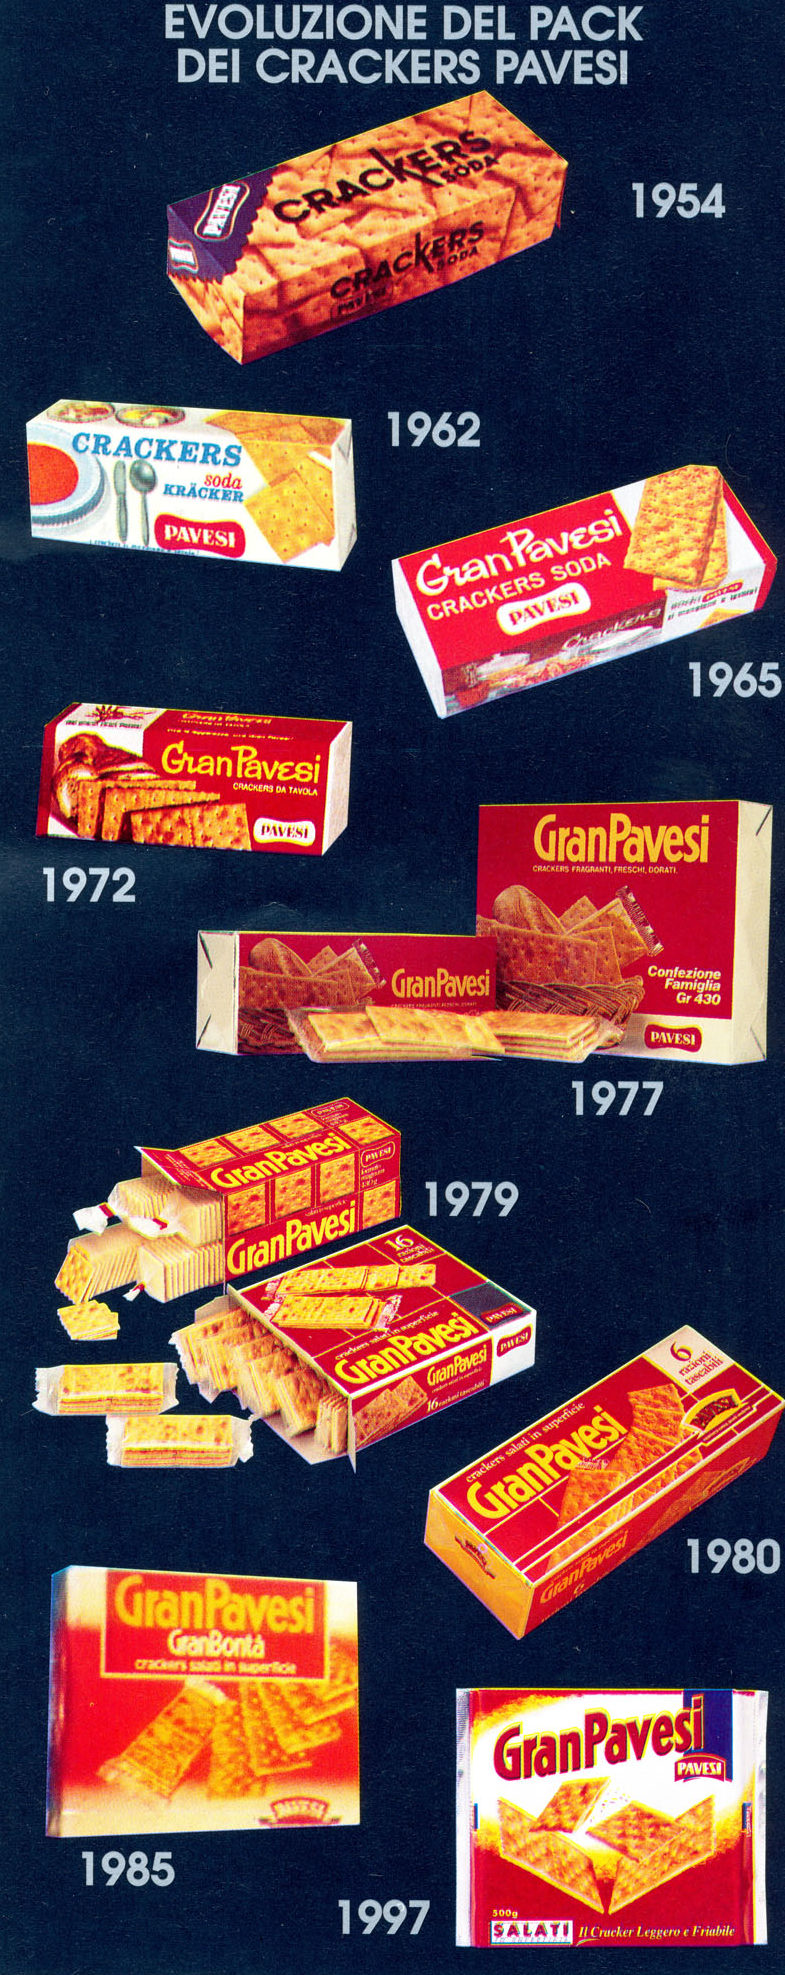 Evolution of Gran Pavesi Crackers' packaging